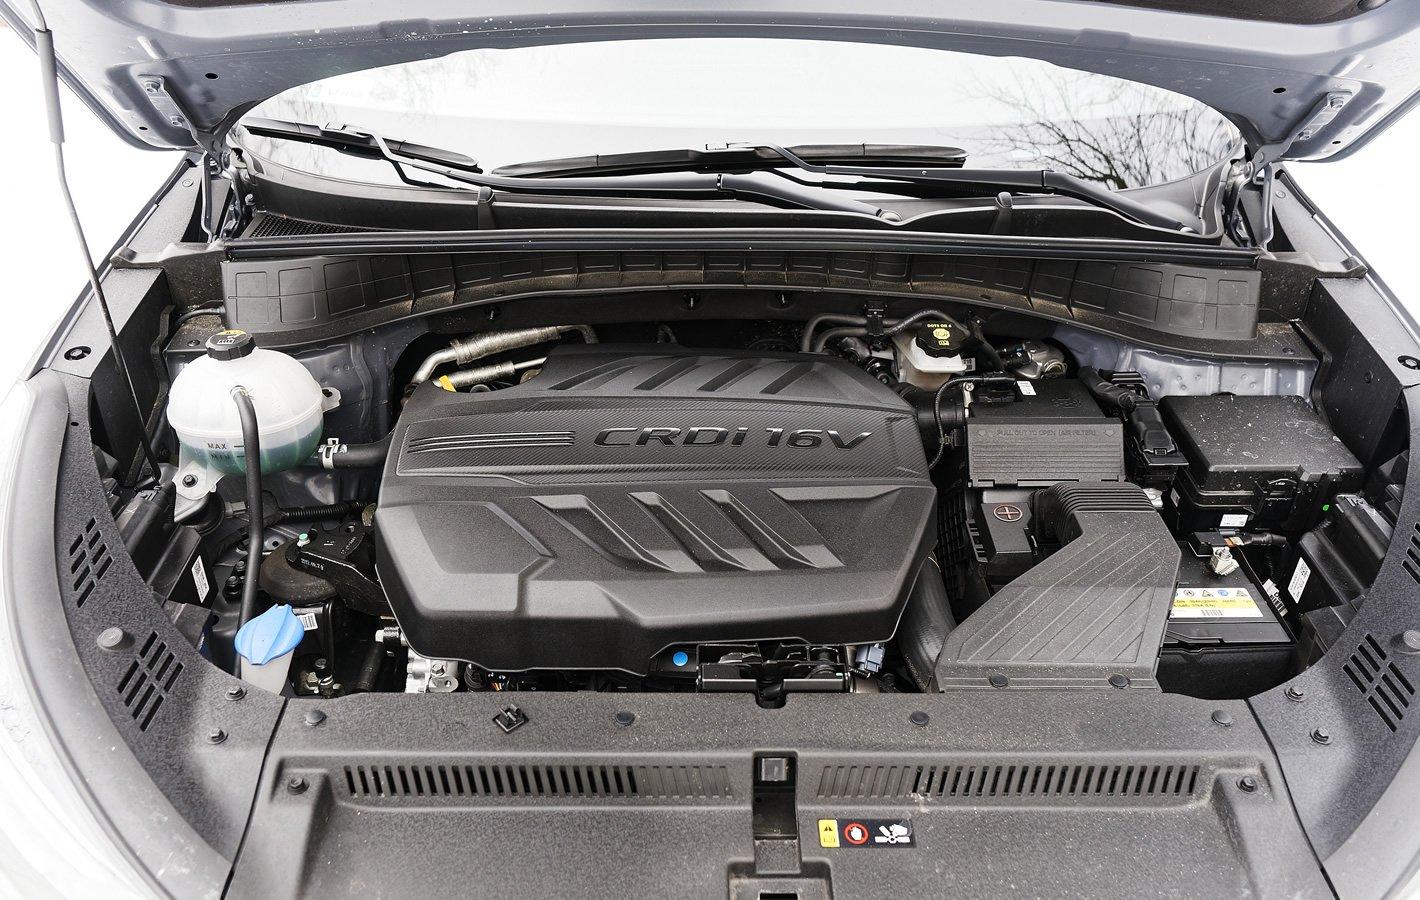 Hyundai Tucson 2.0 CRDi 48V - silnik